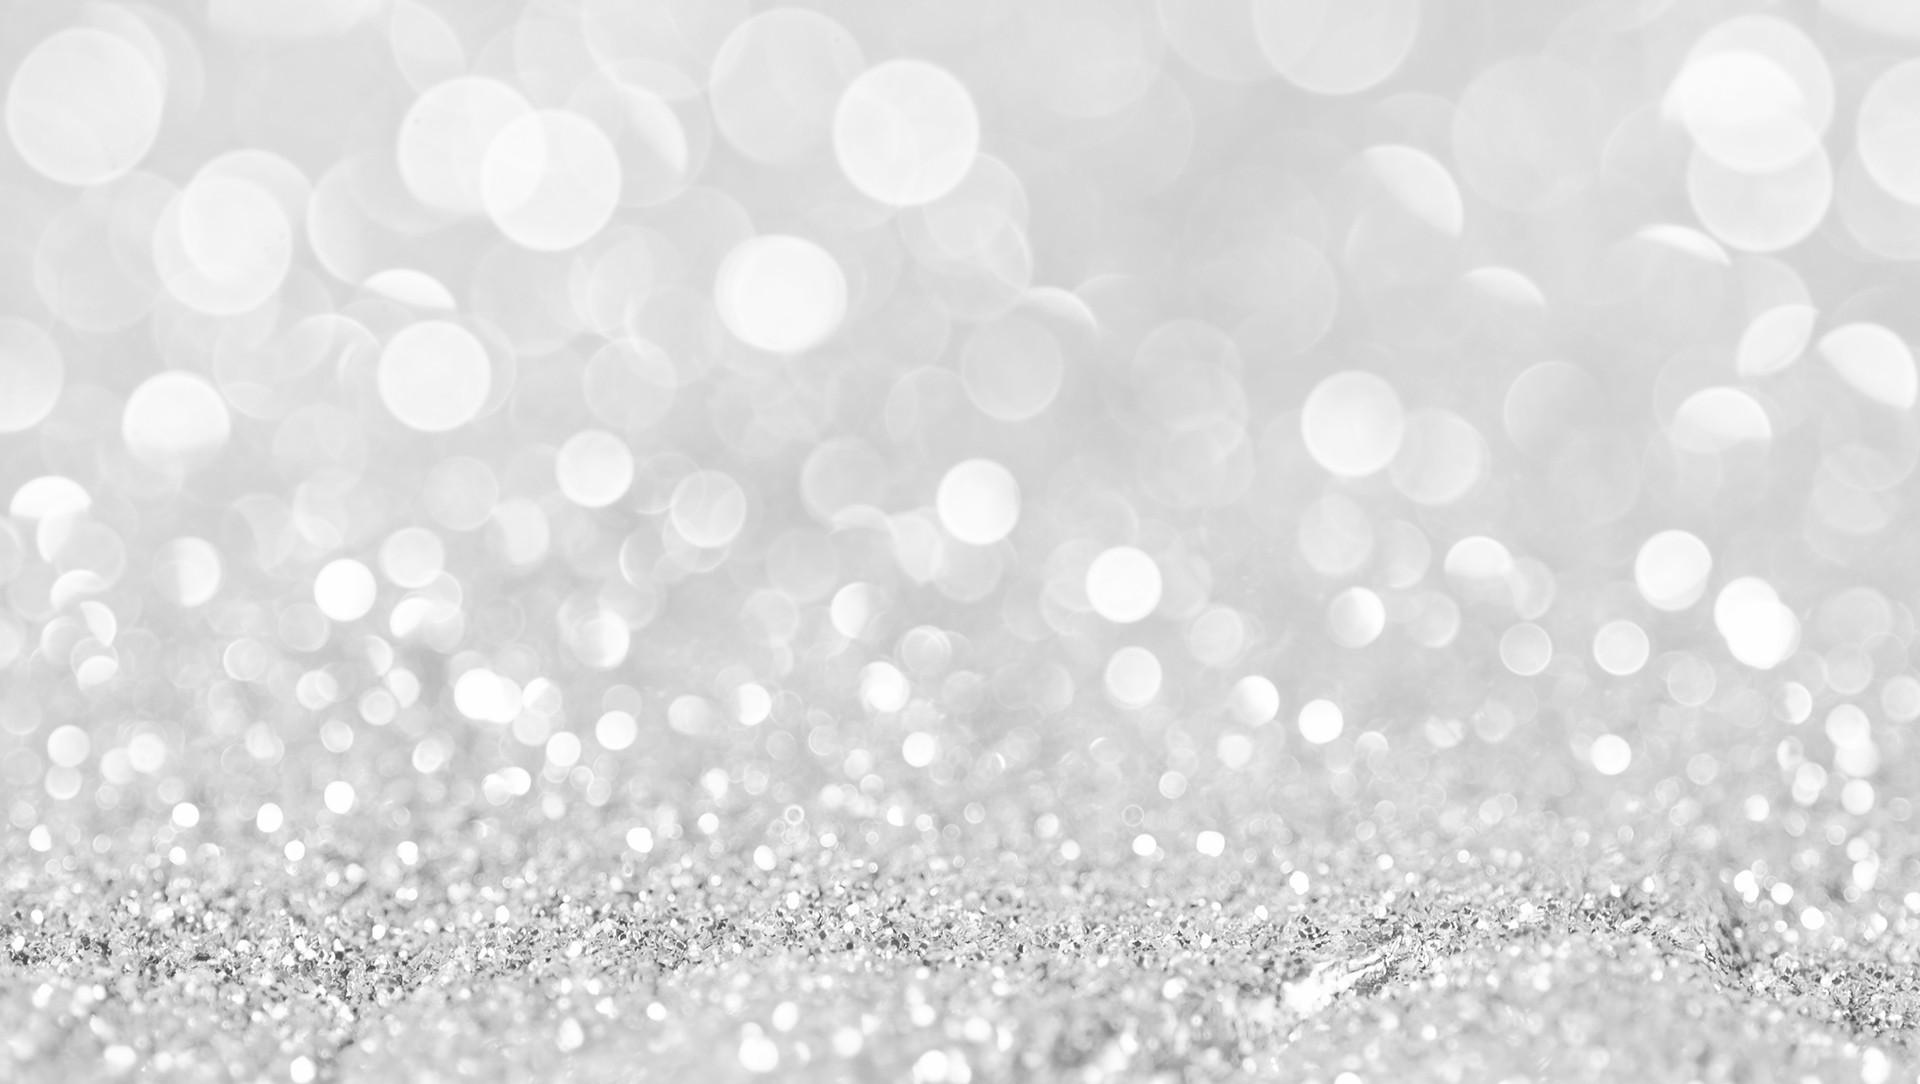 Silver Hd Wallpaper: HD Glitter Wallpaper (79+ Images